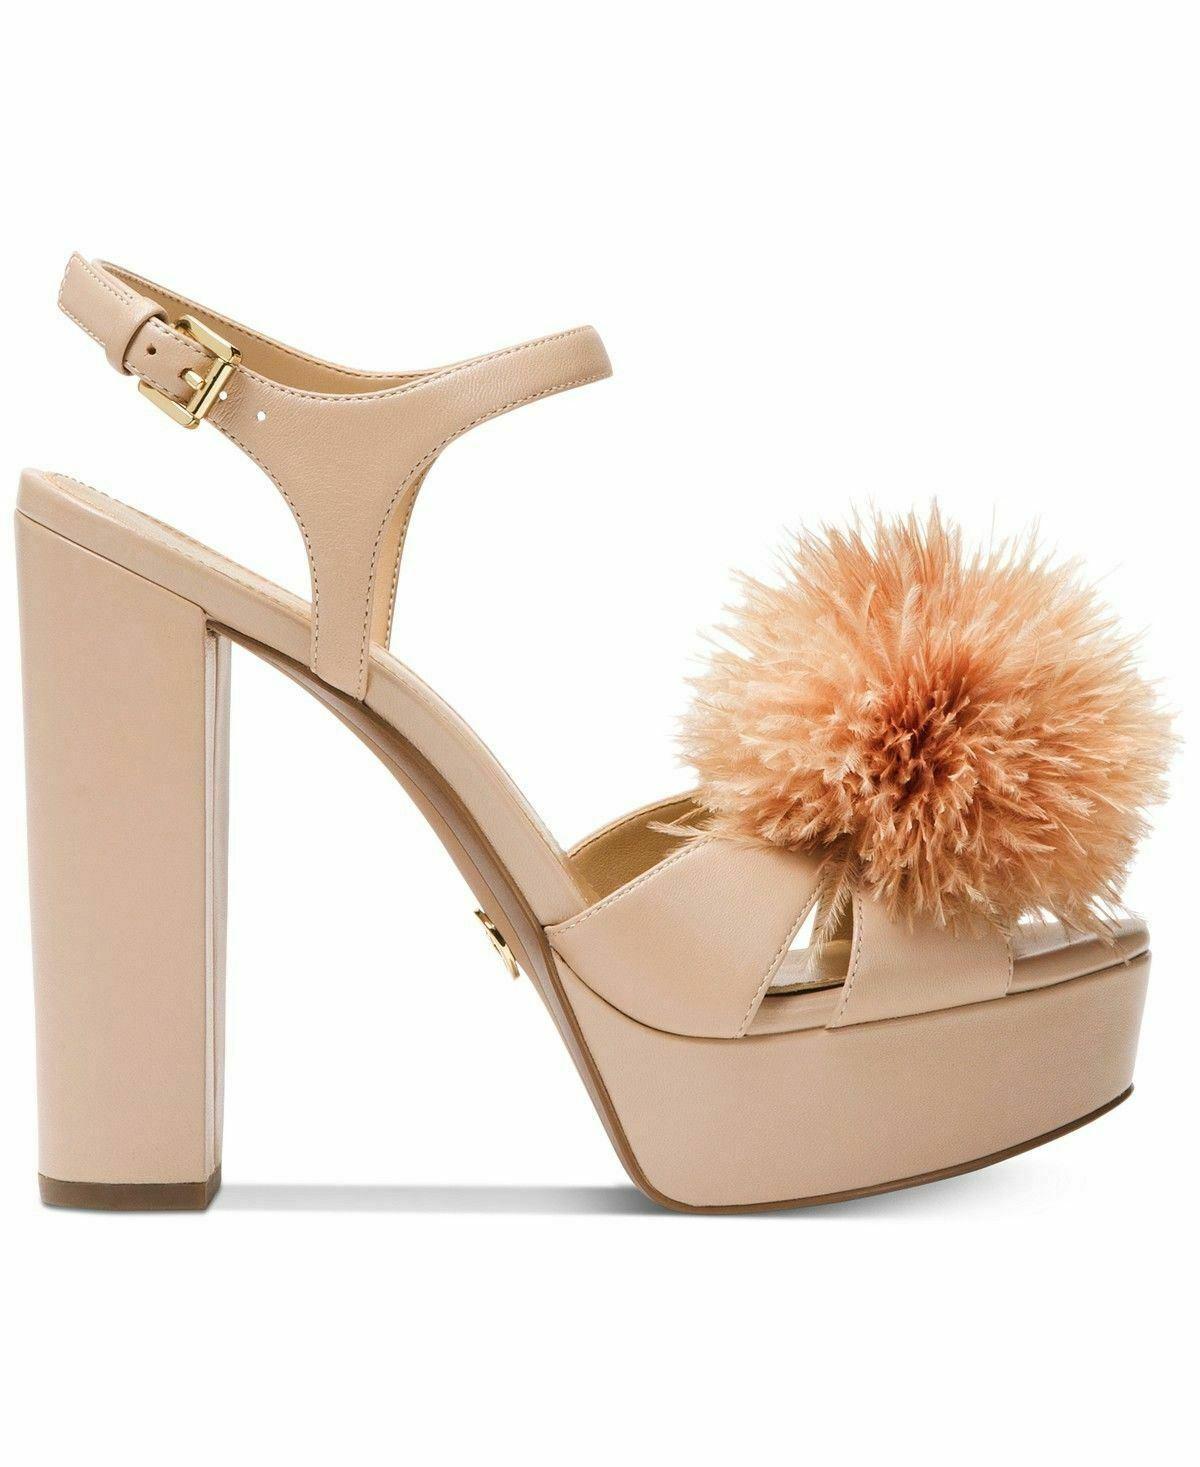 MICHAEL Michael Kors womens Fara Platform Sandals size 9M Color Oyster heels NWB image 3